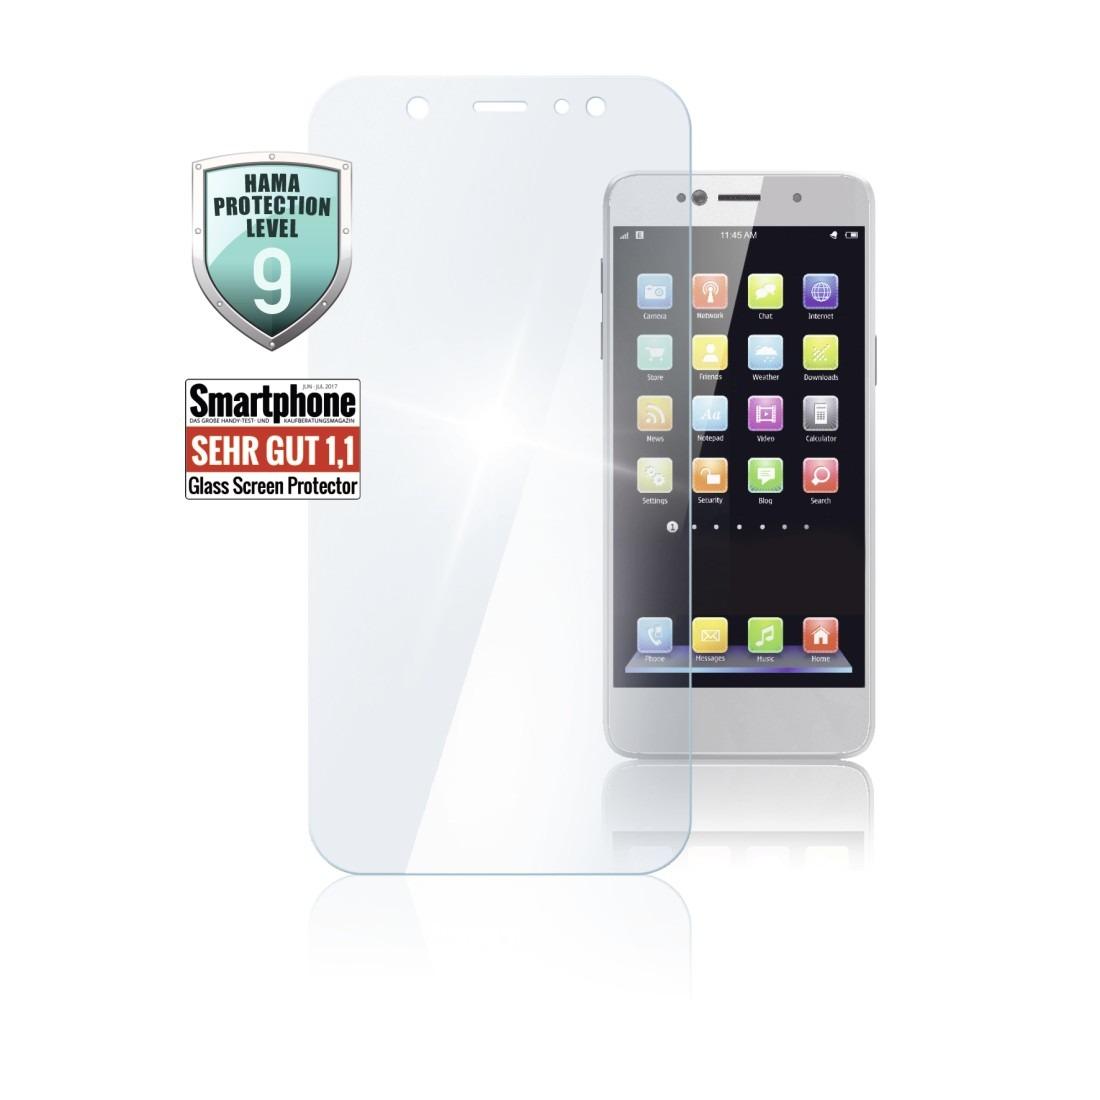 Hama Premium screenprotector voor Samsung Galaxy A40 Smartphone screenprotector Transparant